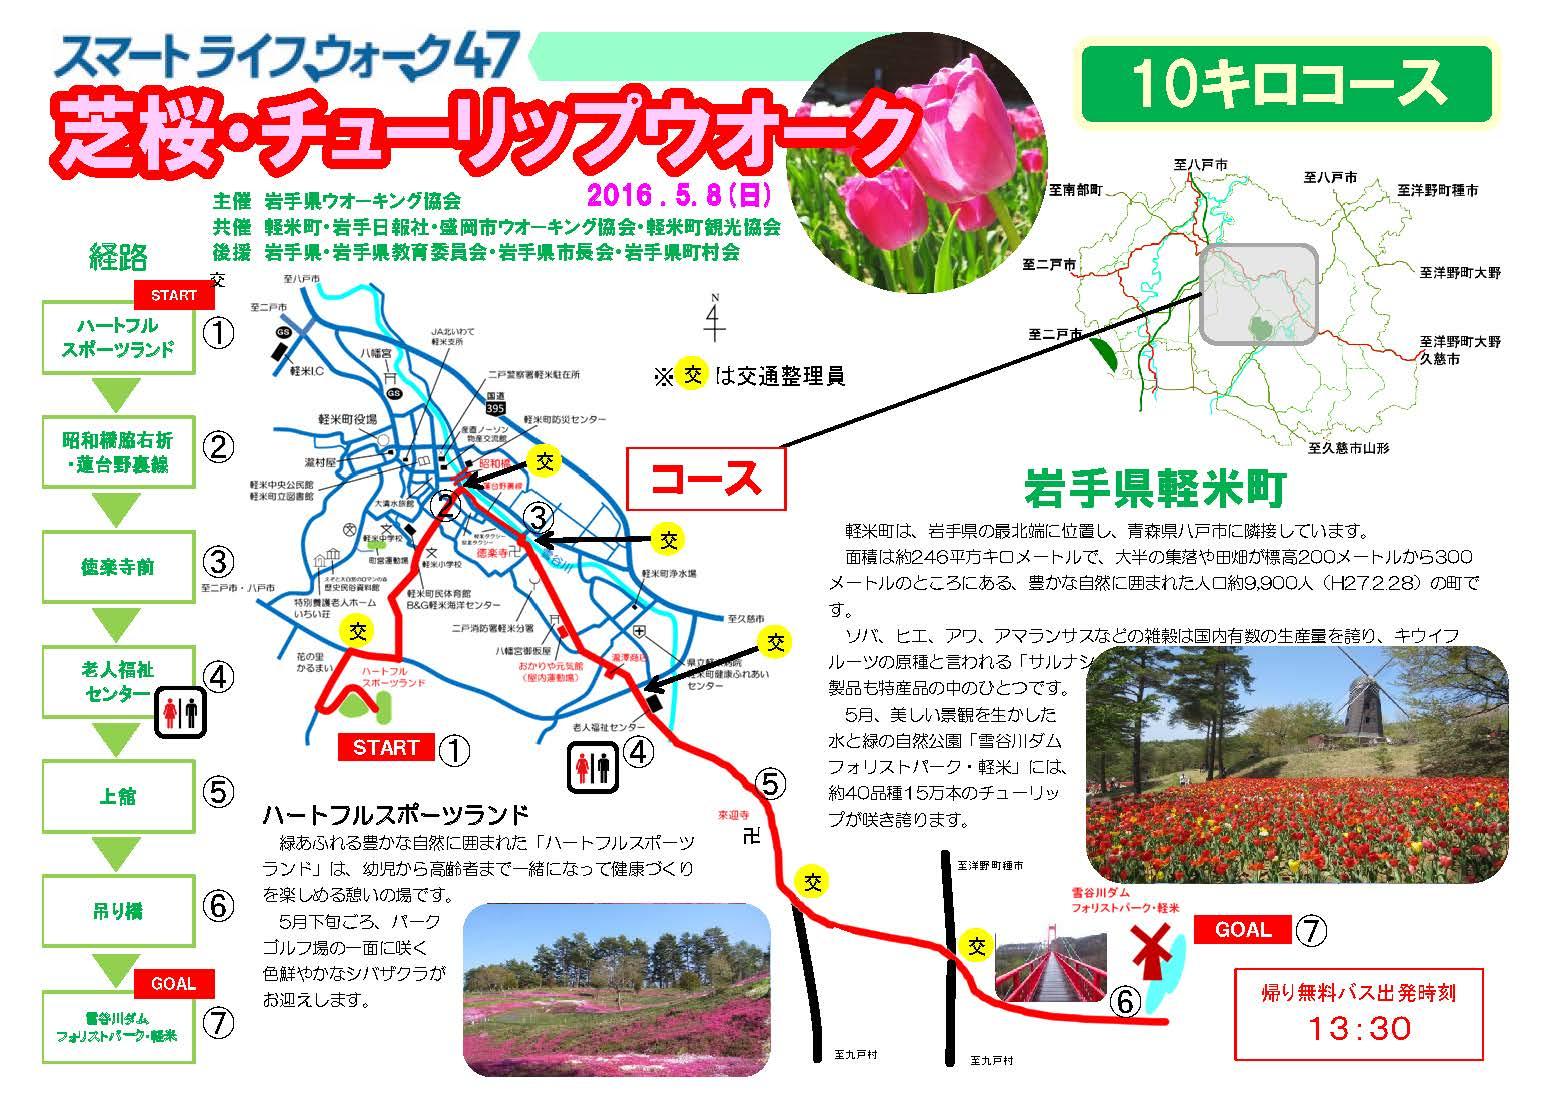 walk2016map_10.png